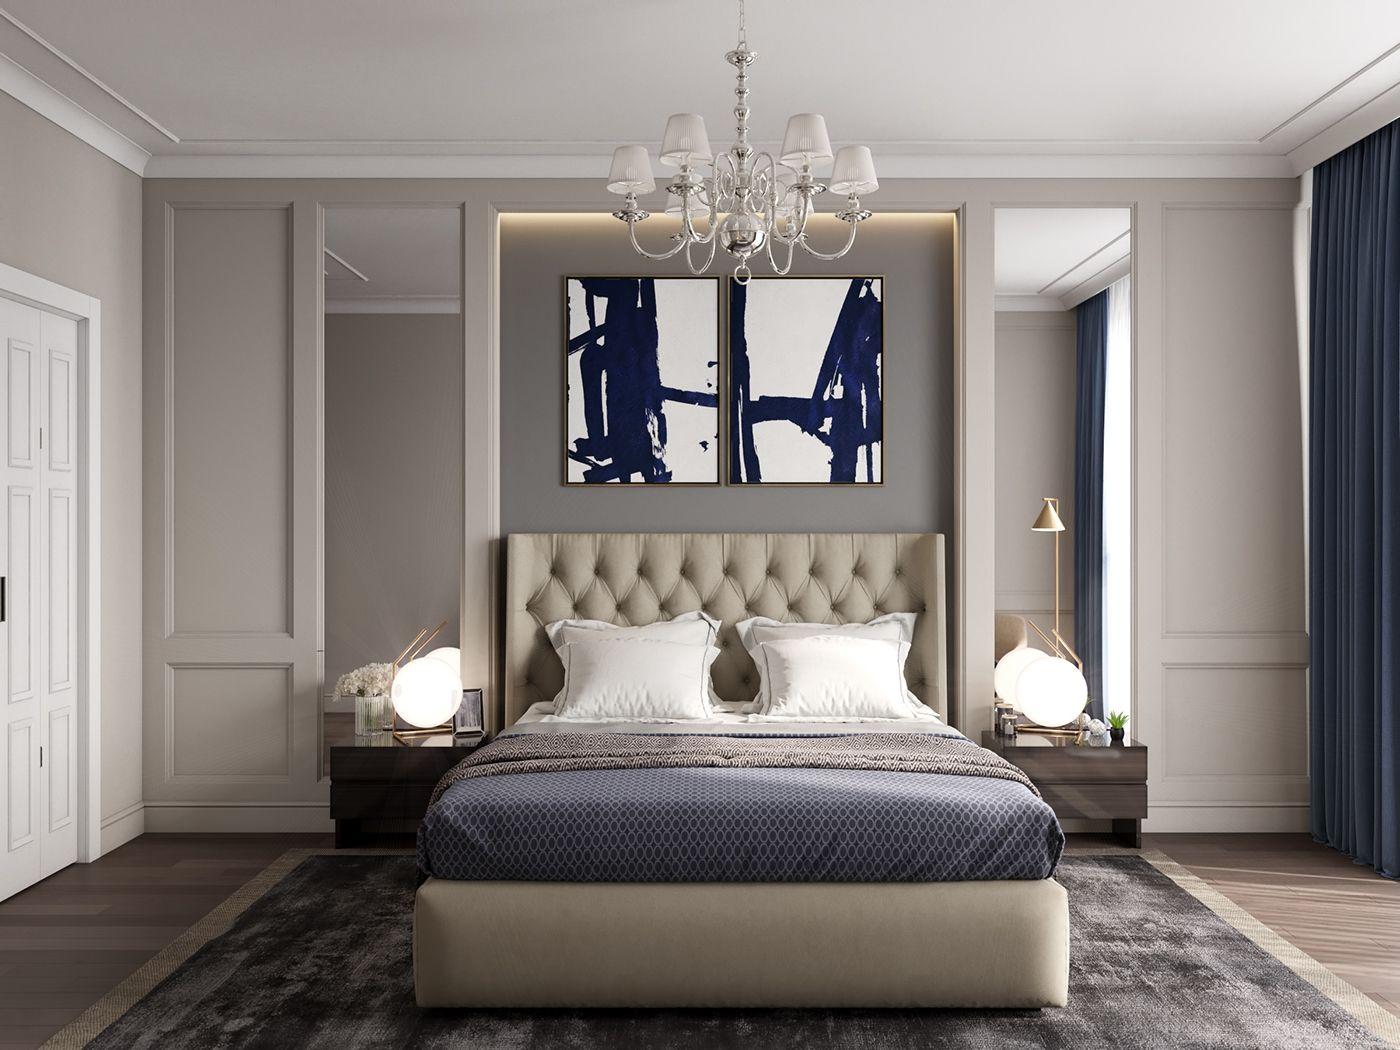 Modern classics in the interior on Behance | Modern ...